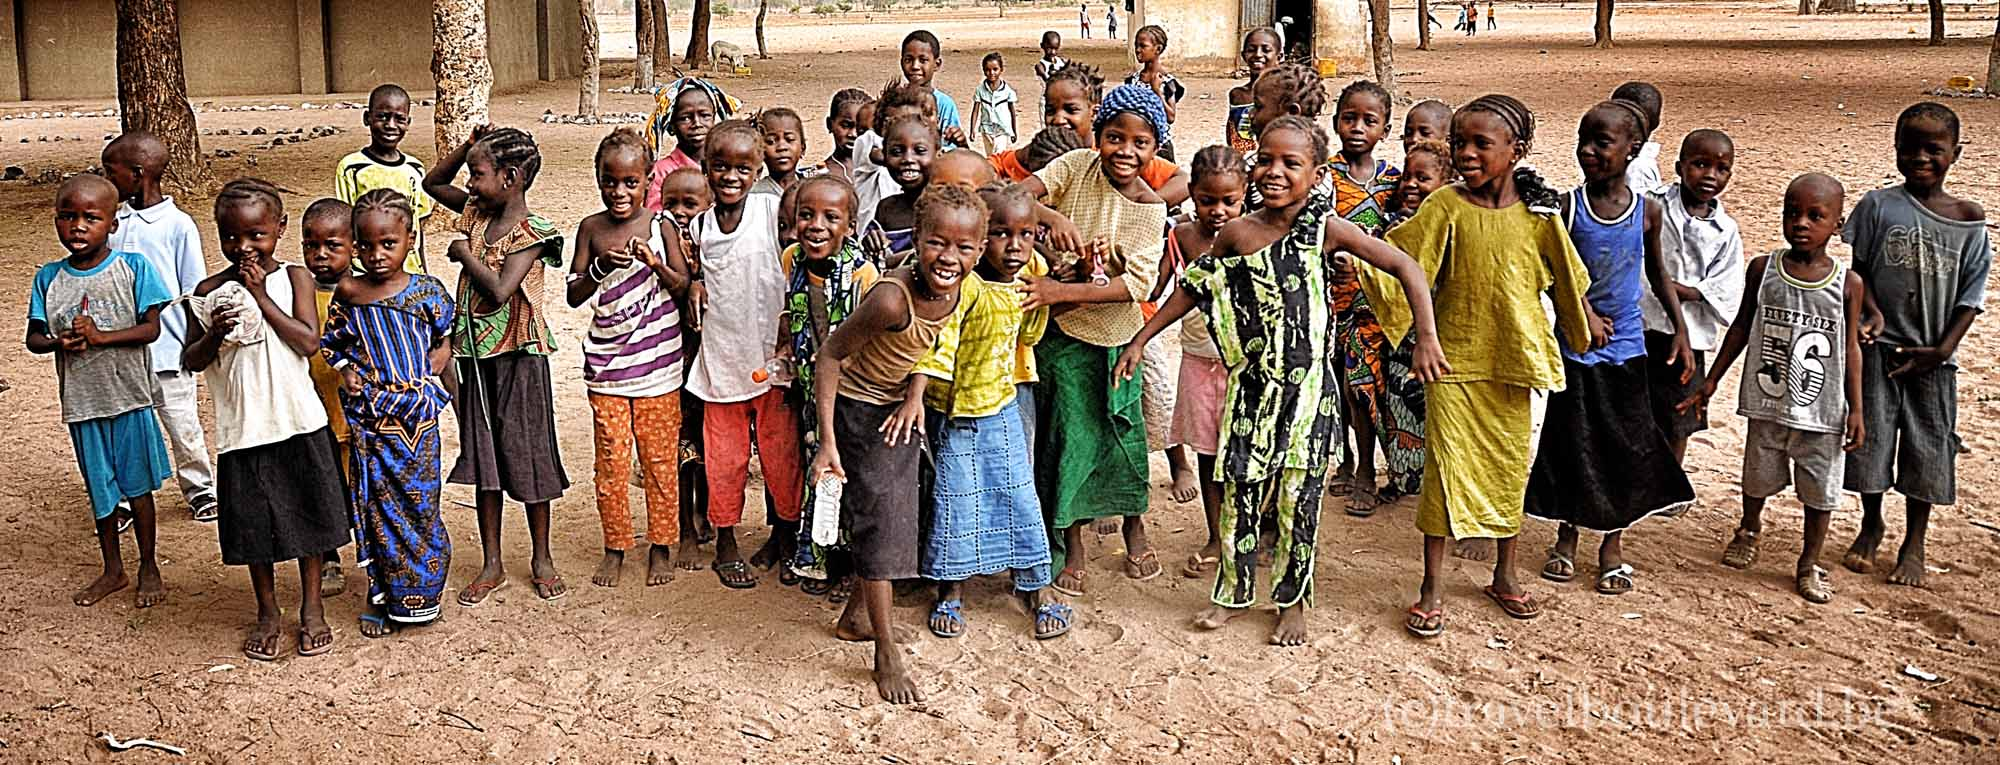 Gambia_school